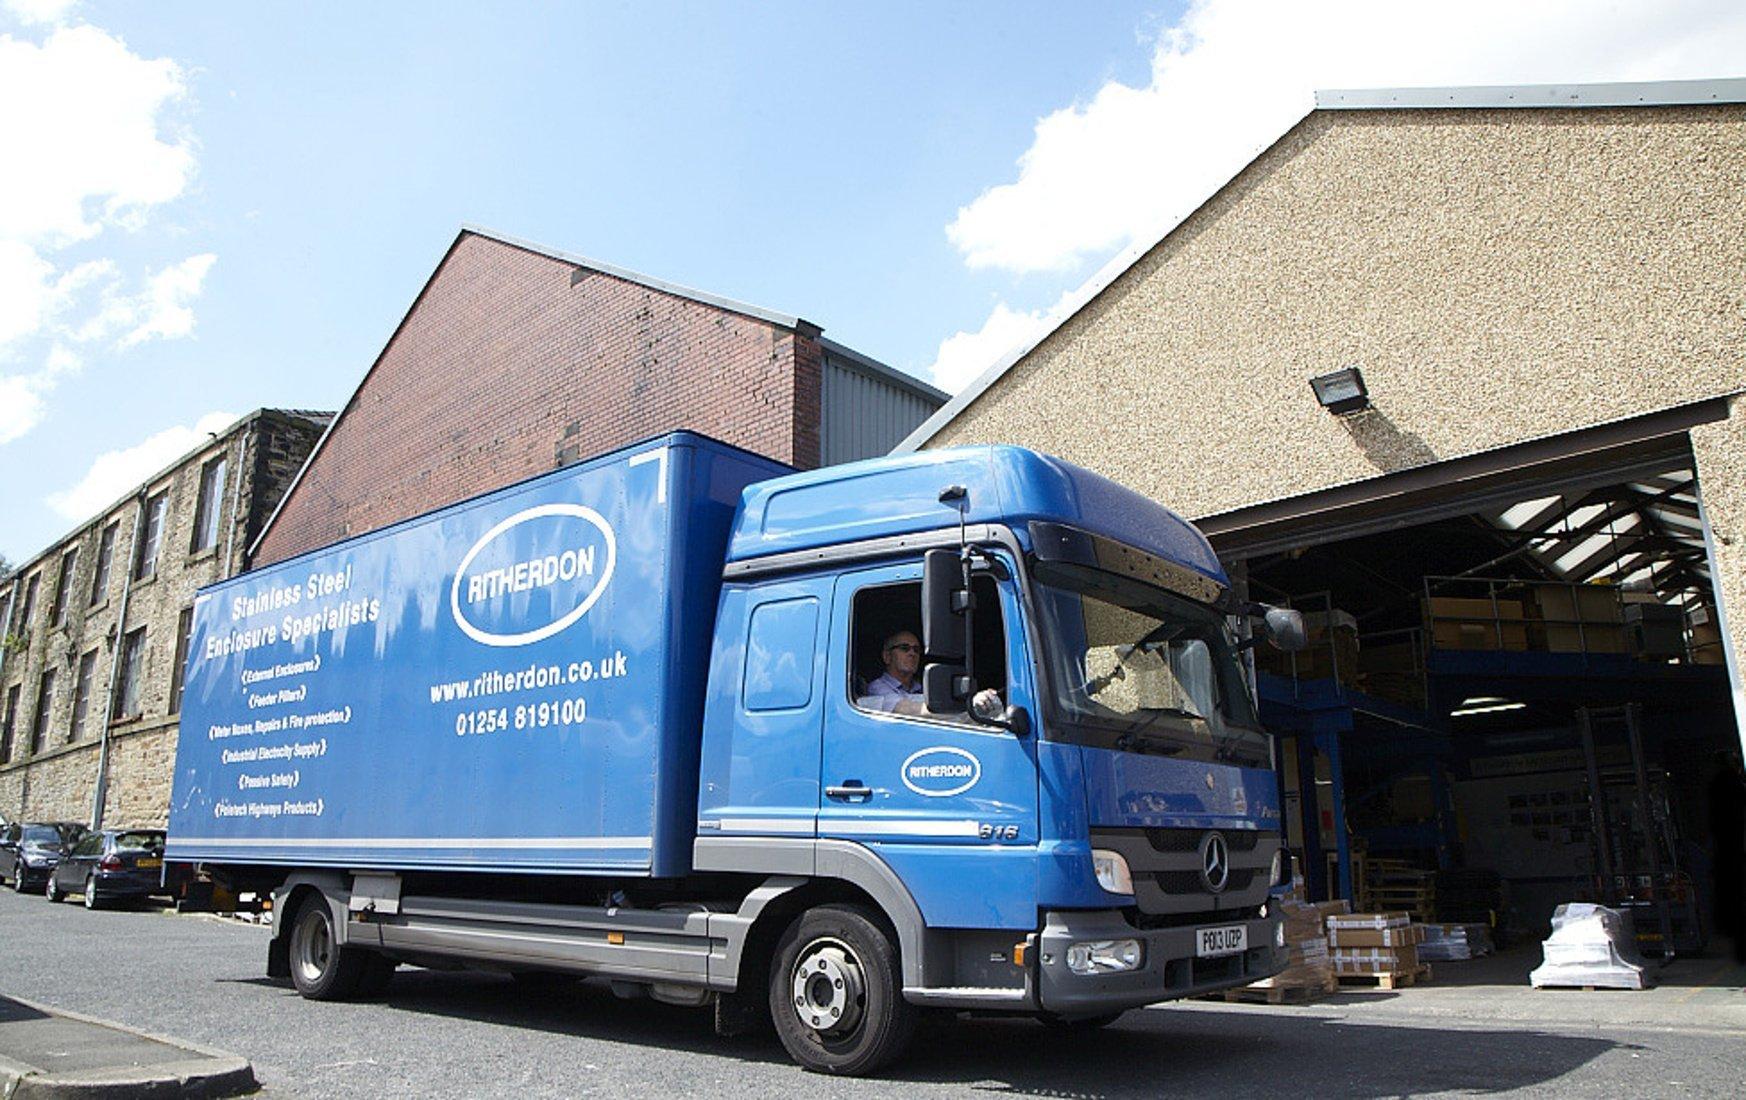 Ritherdon Delivery Van